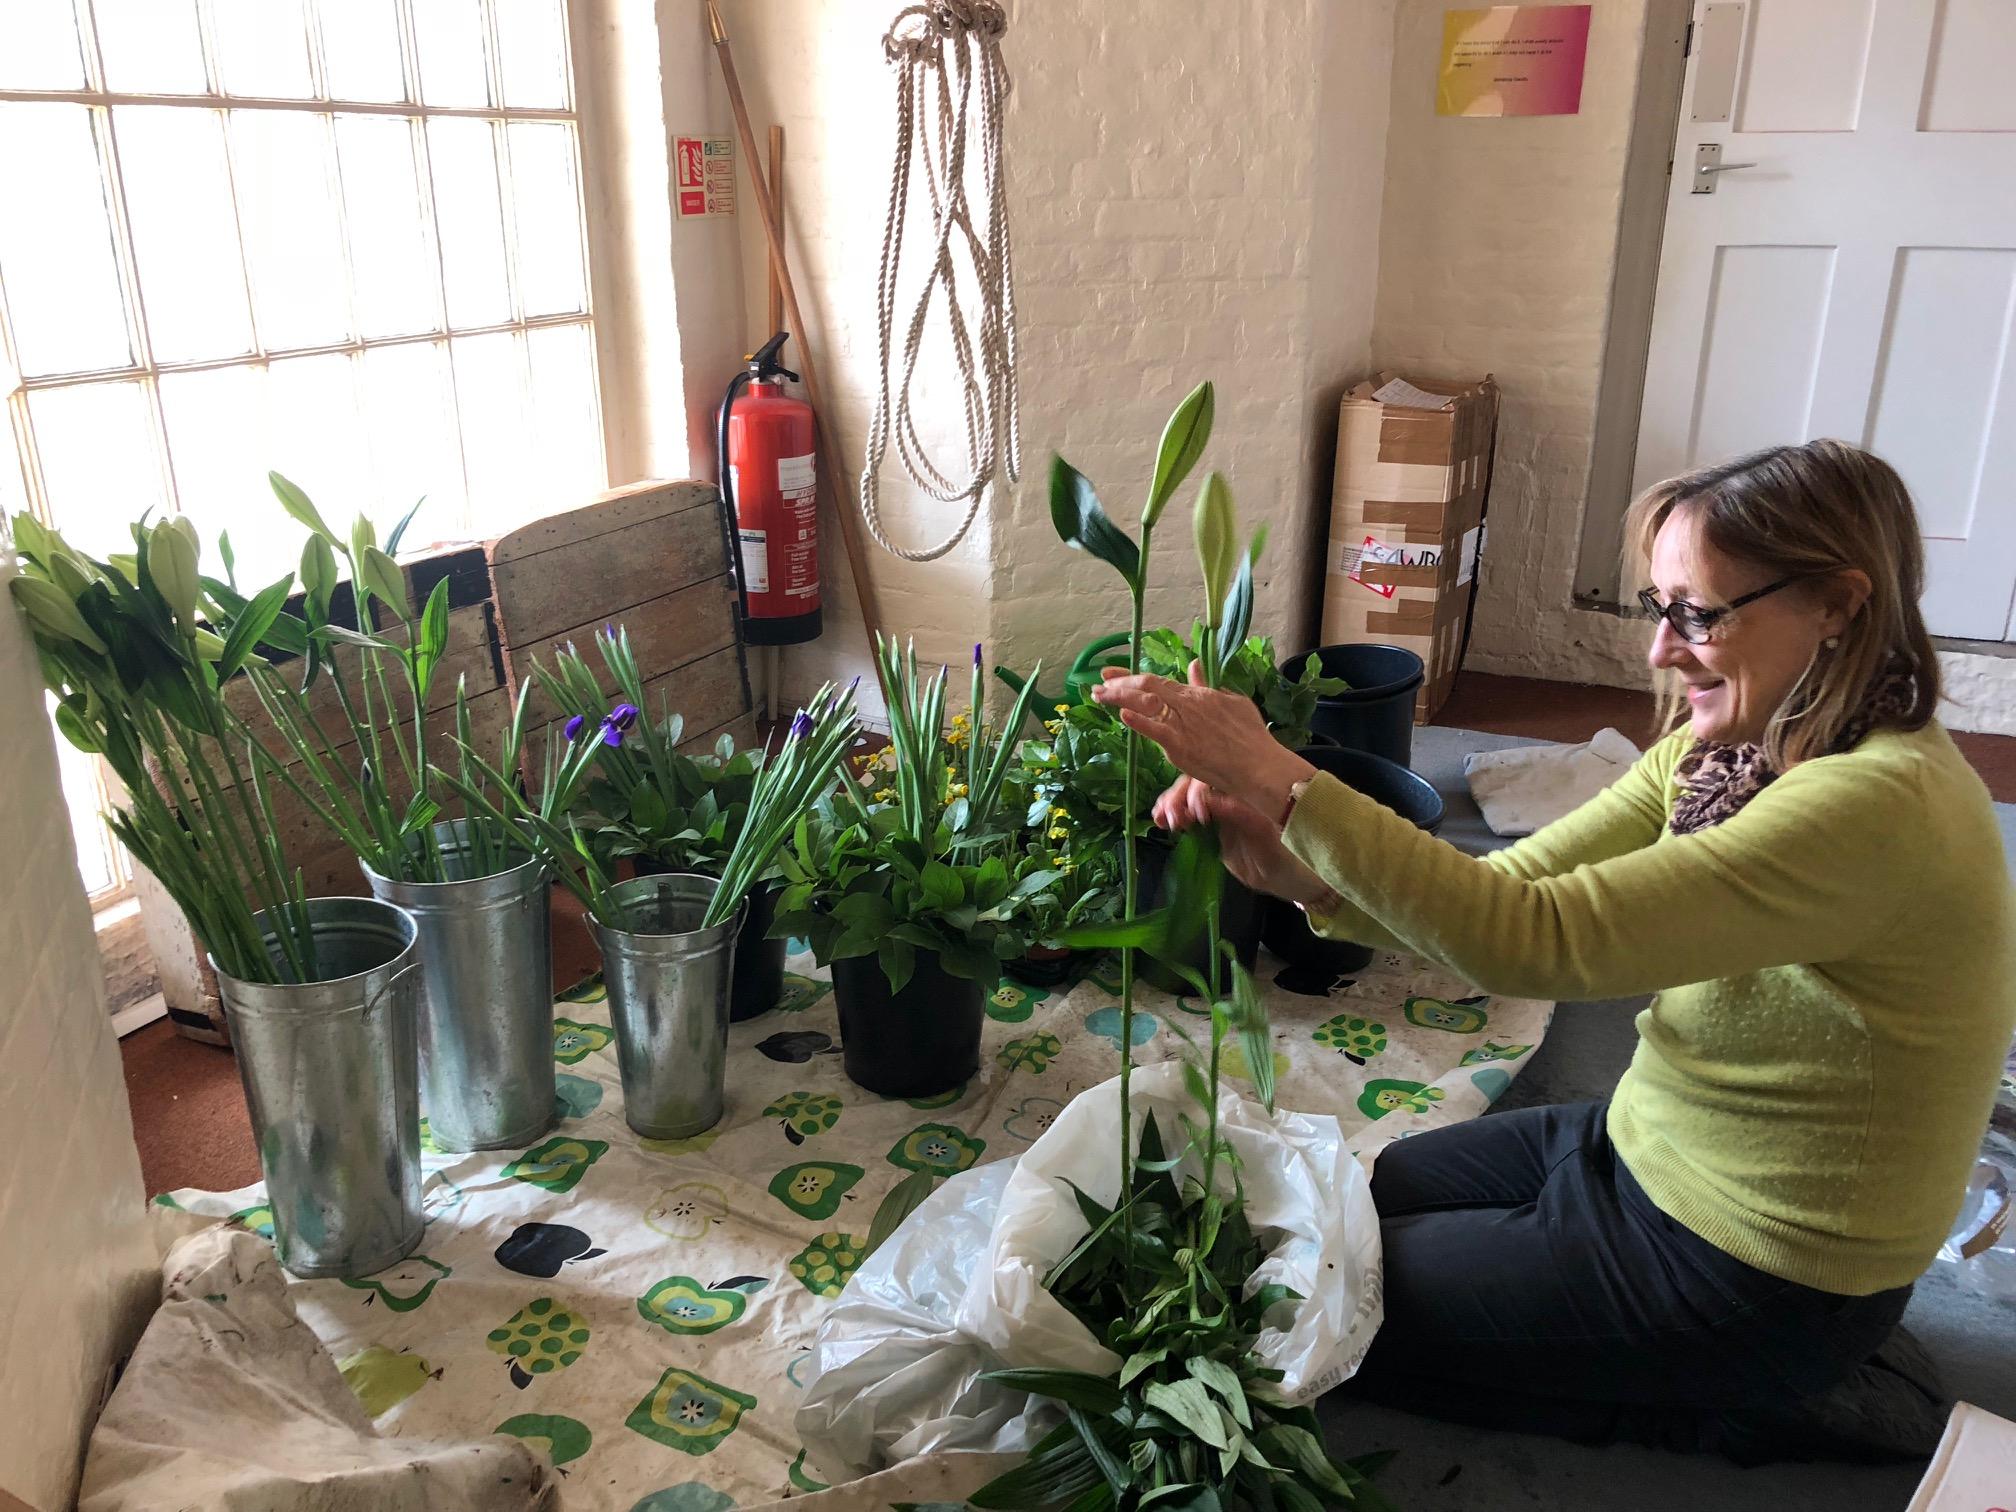 Floristry in the Belfry